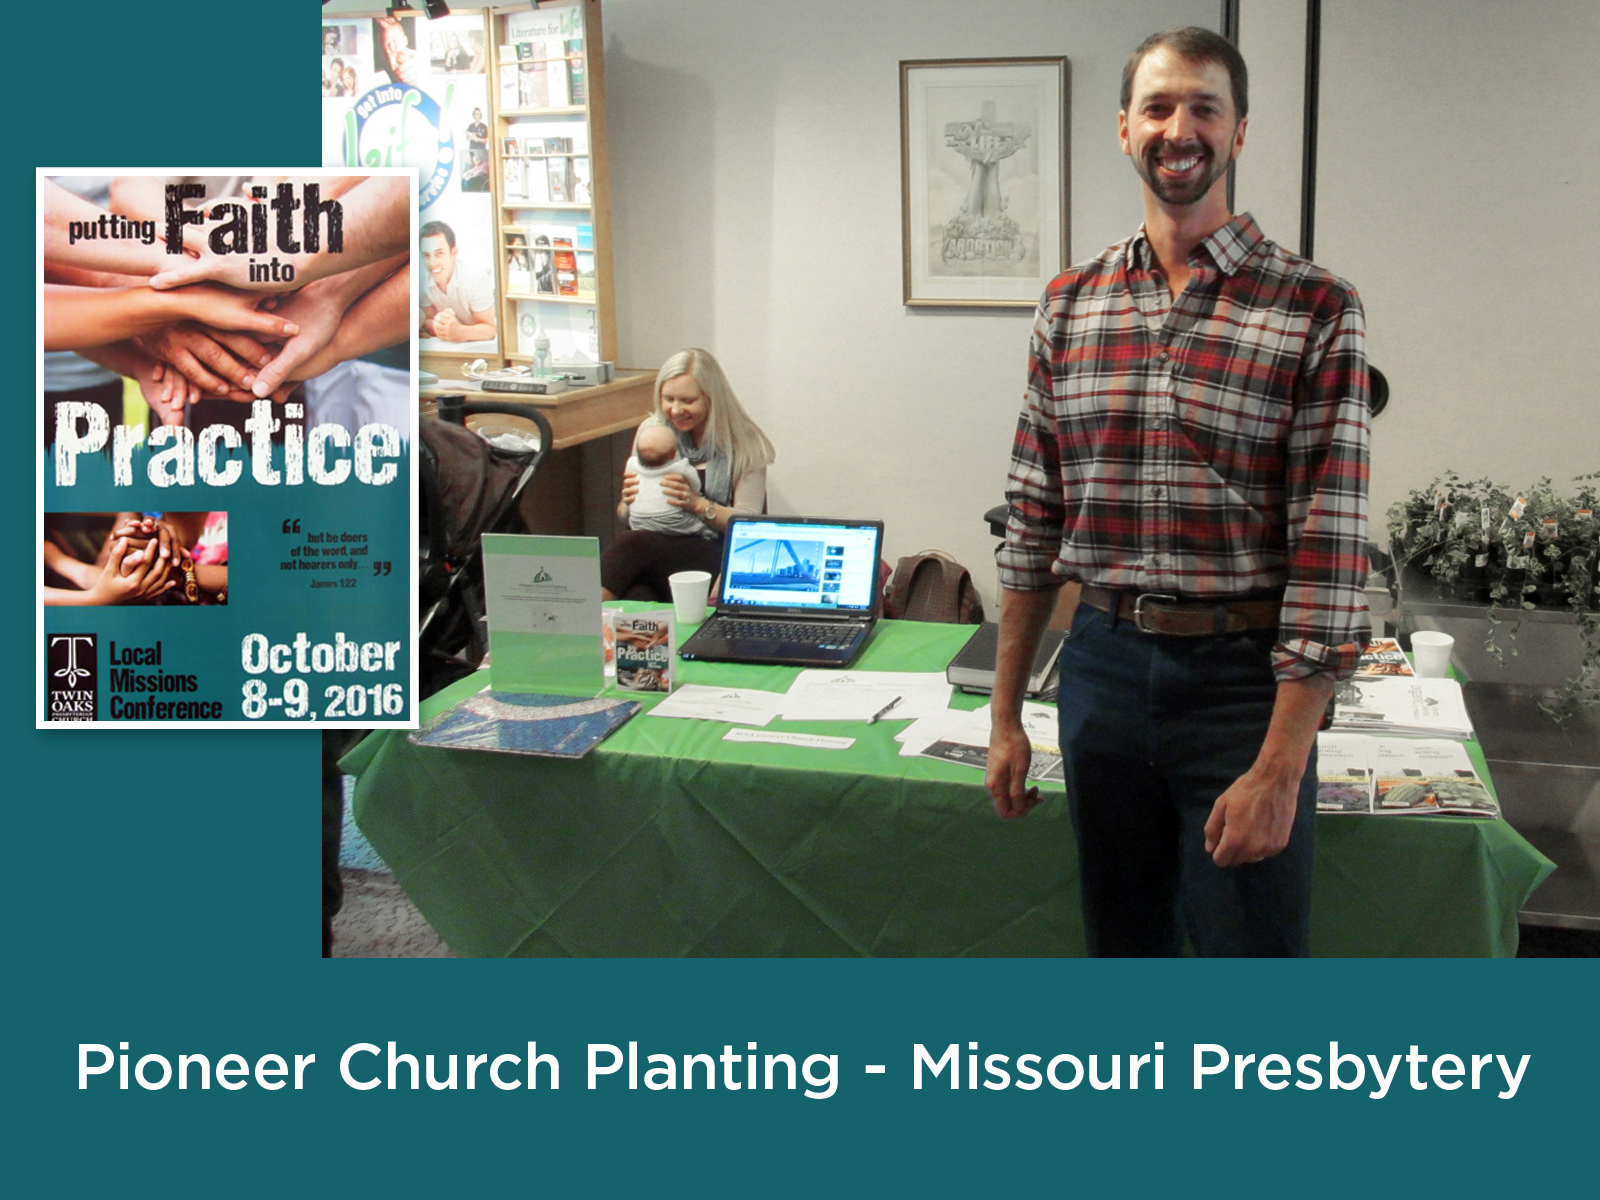 Pioneer Church Planting - Missouri Presbytery 1.JPG